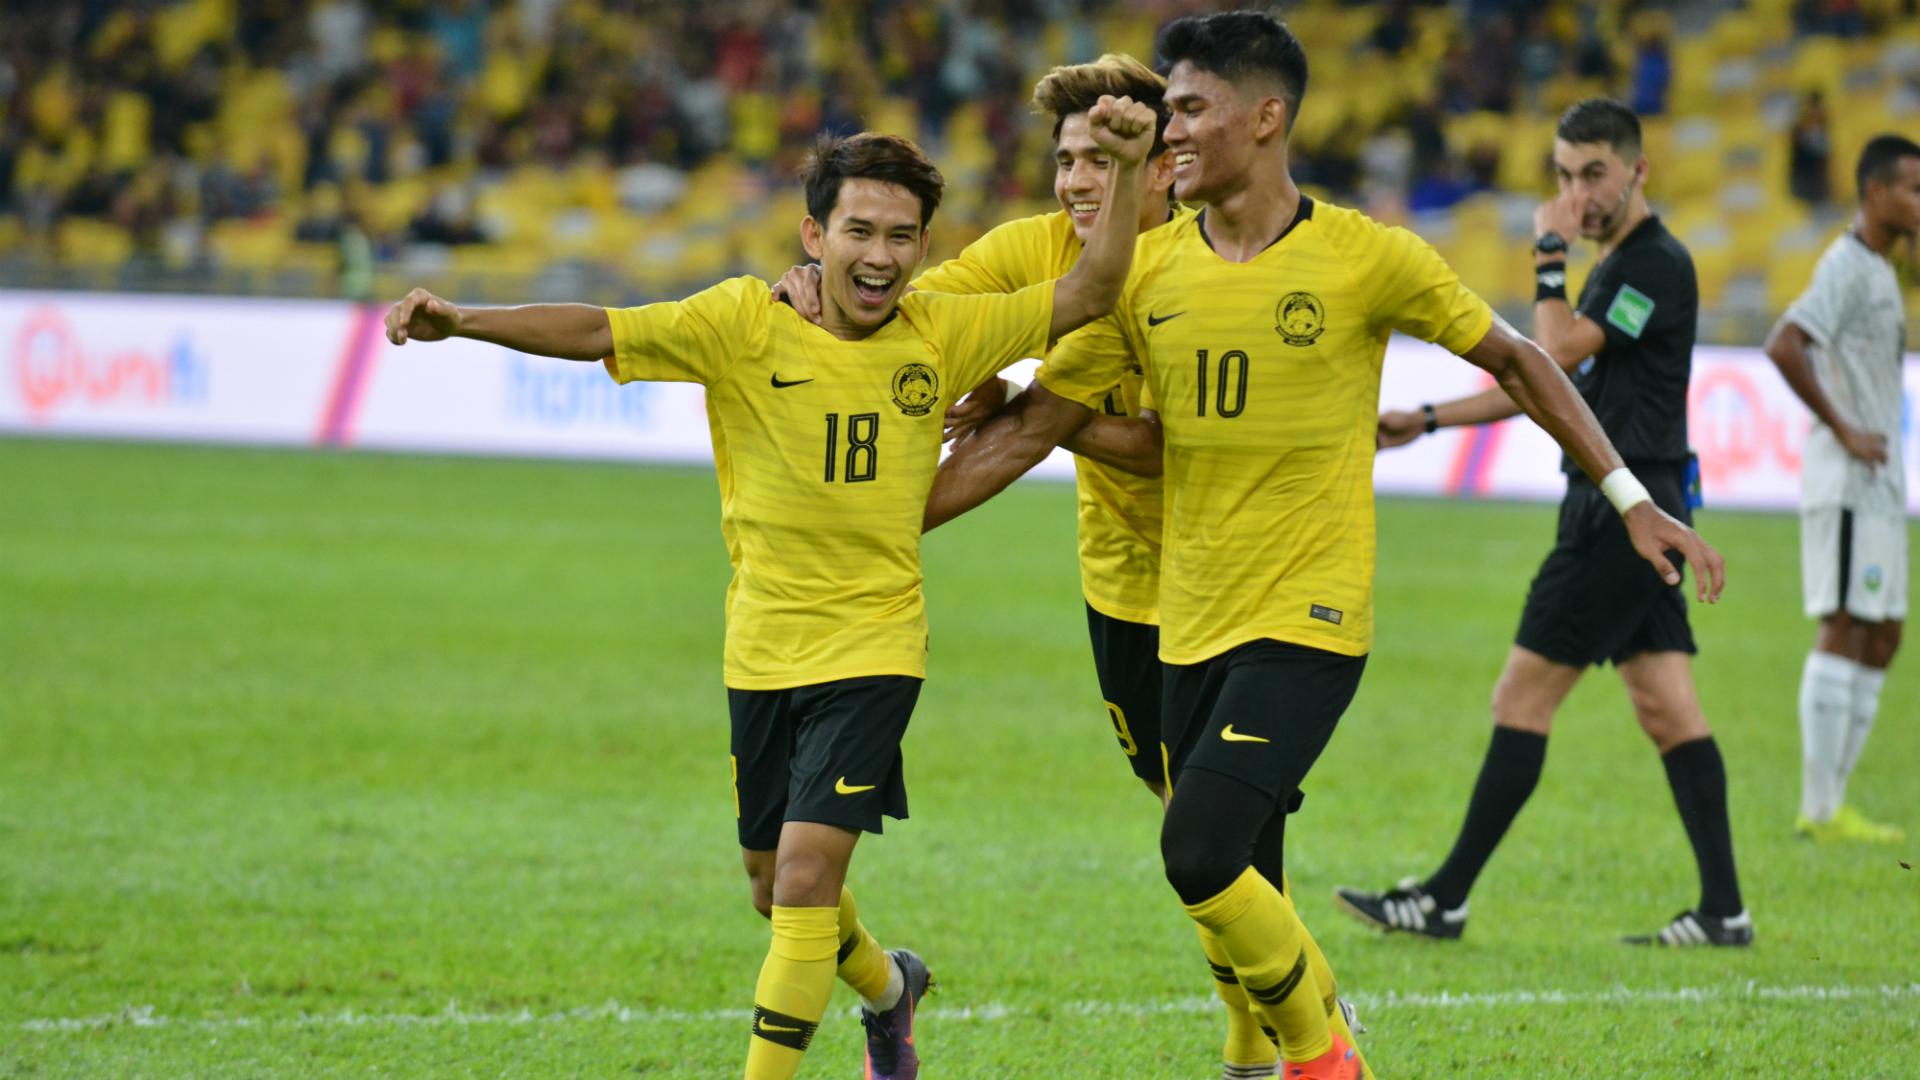 Faiz Nasir, Malaysia v Timor Leste, 2022 World Cup Qualification, 7 Jun 2019